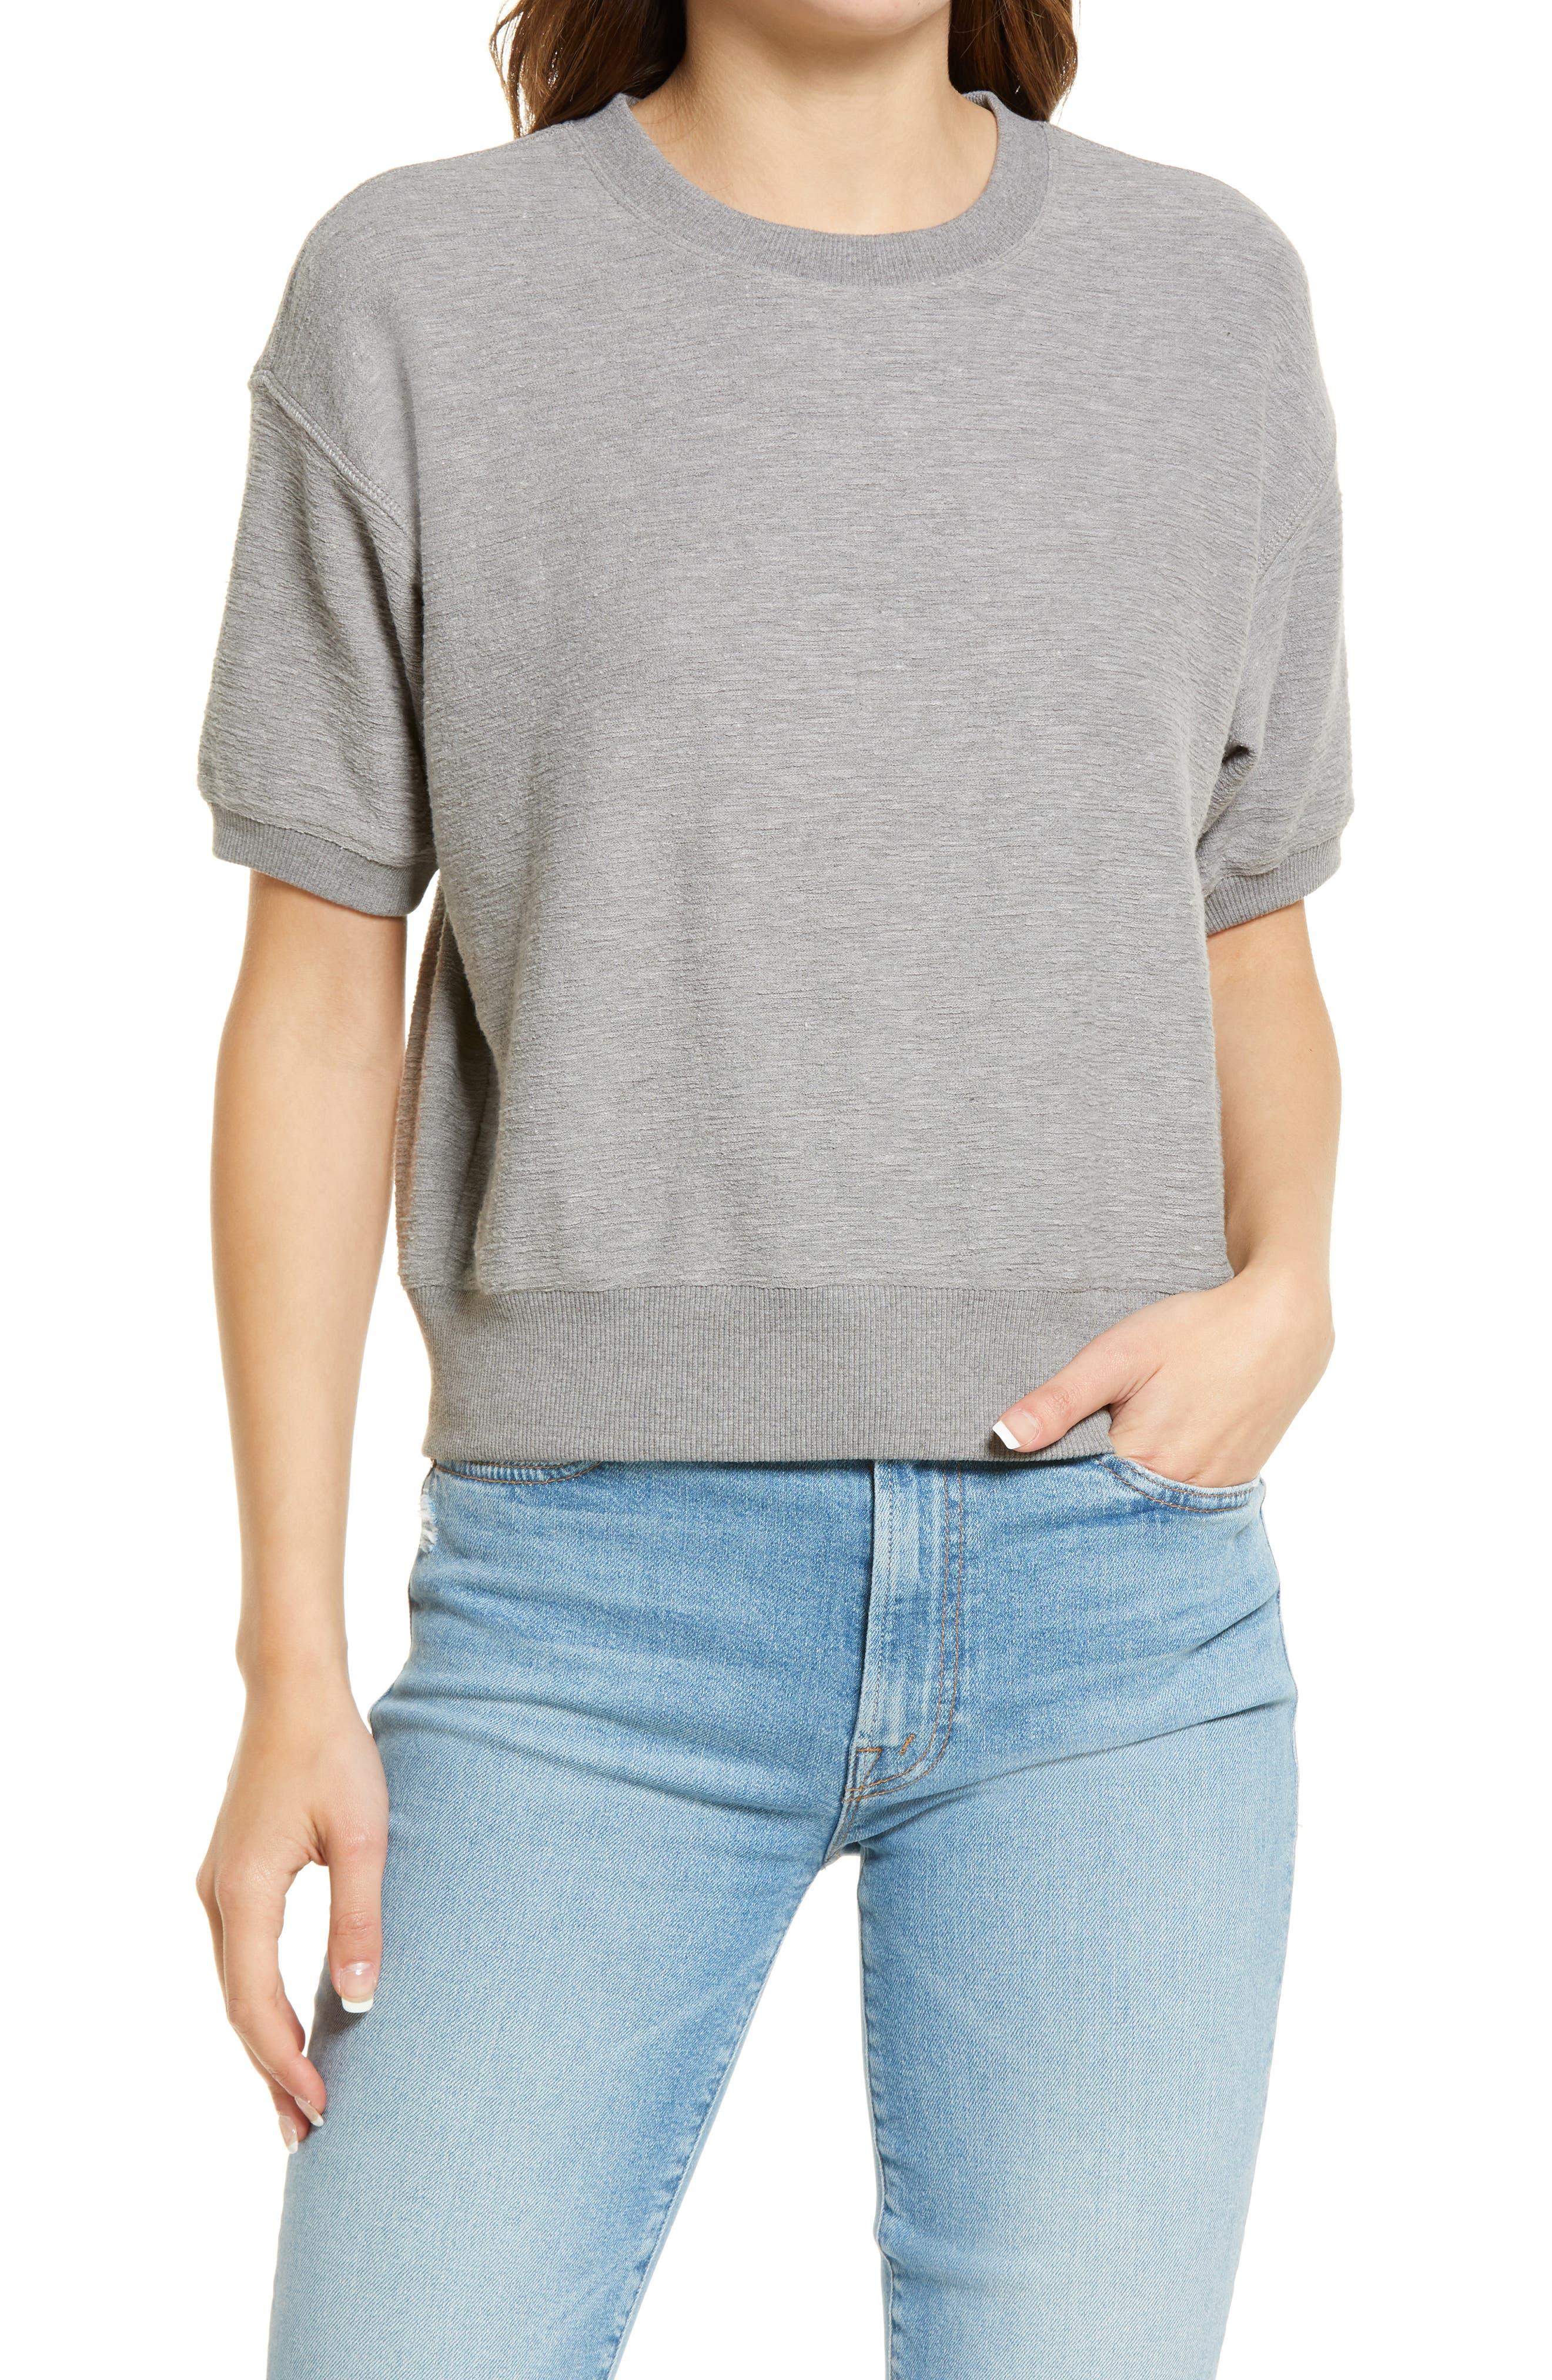 Harmon Slubbed Short Sleeve Top